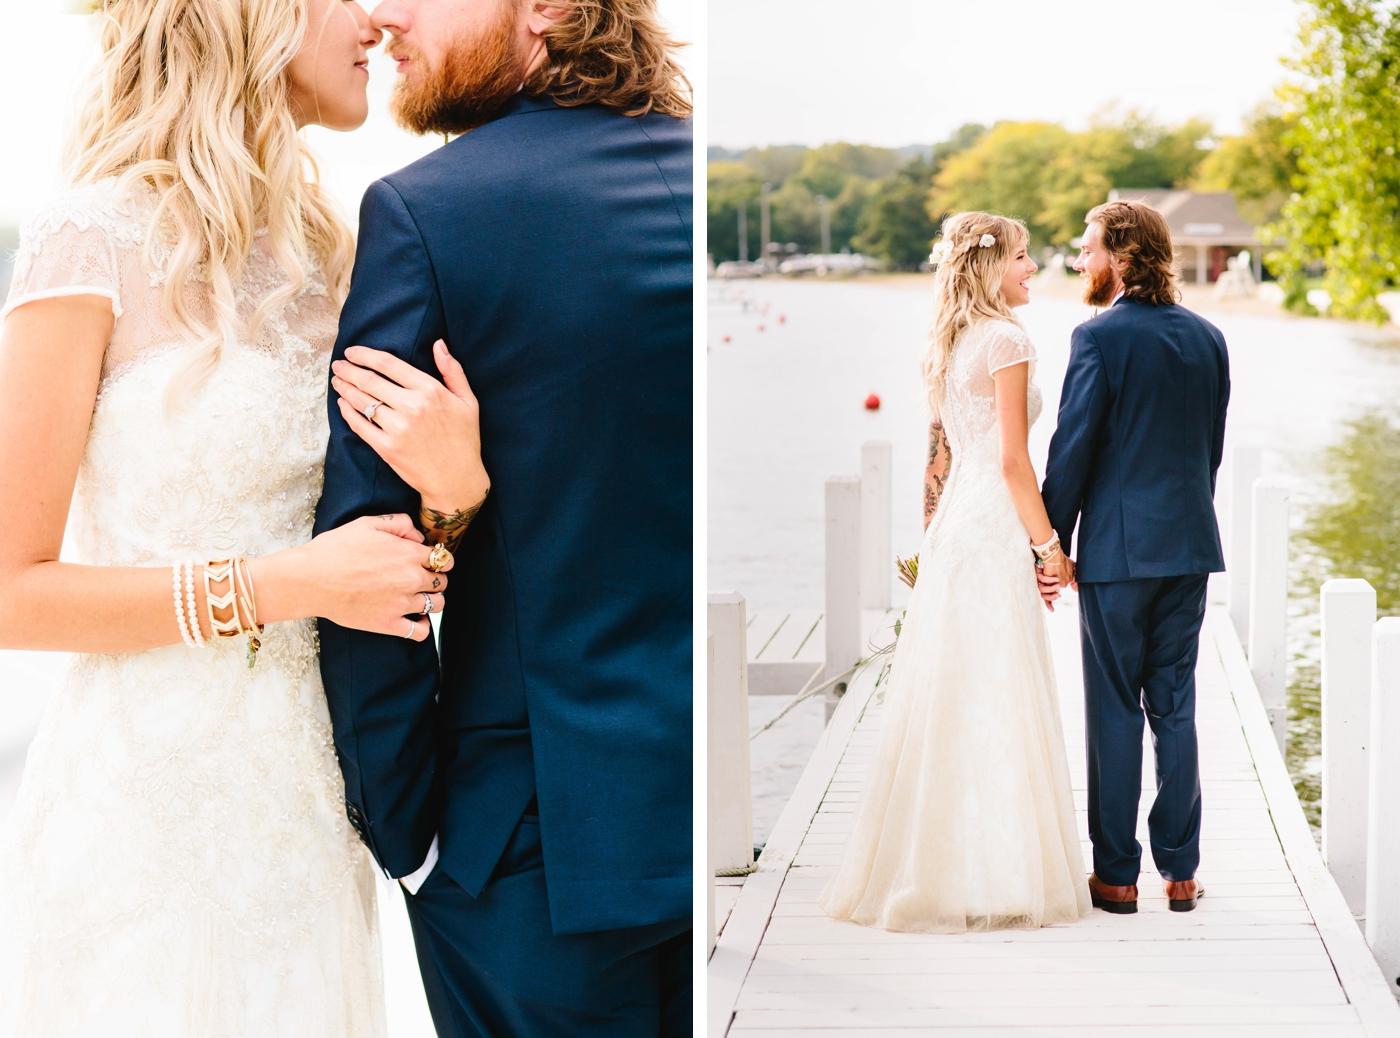 chicago-fine-art-wedding-photography-chriskelsey26